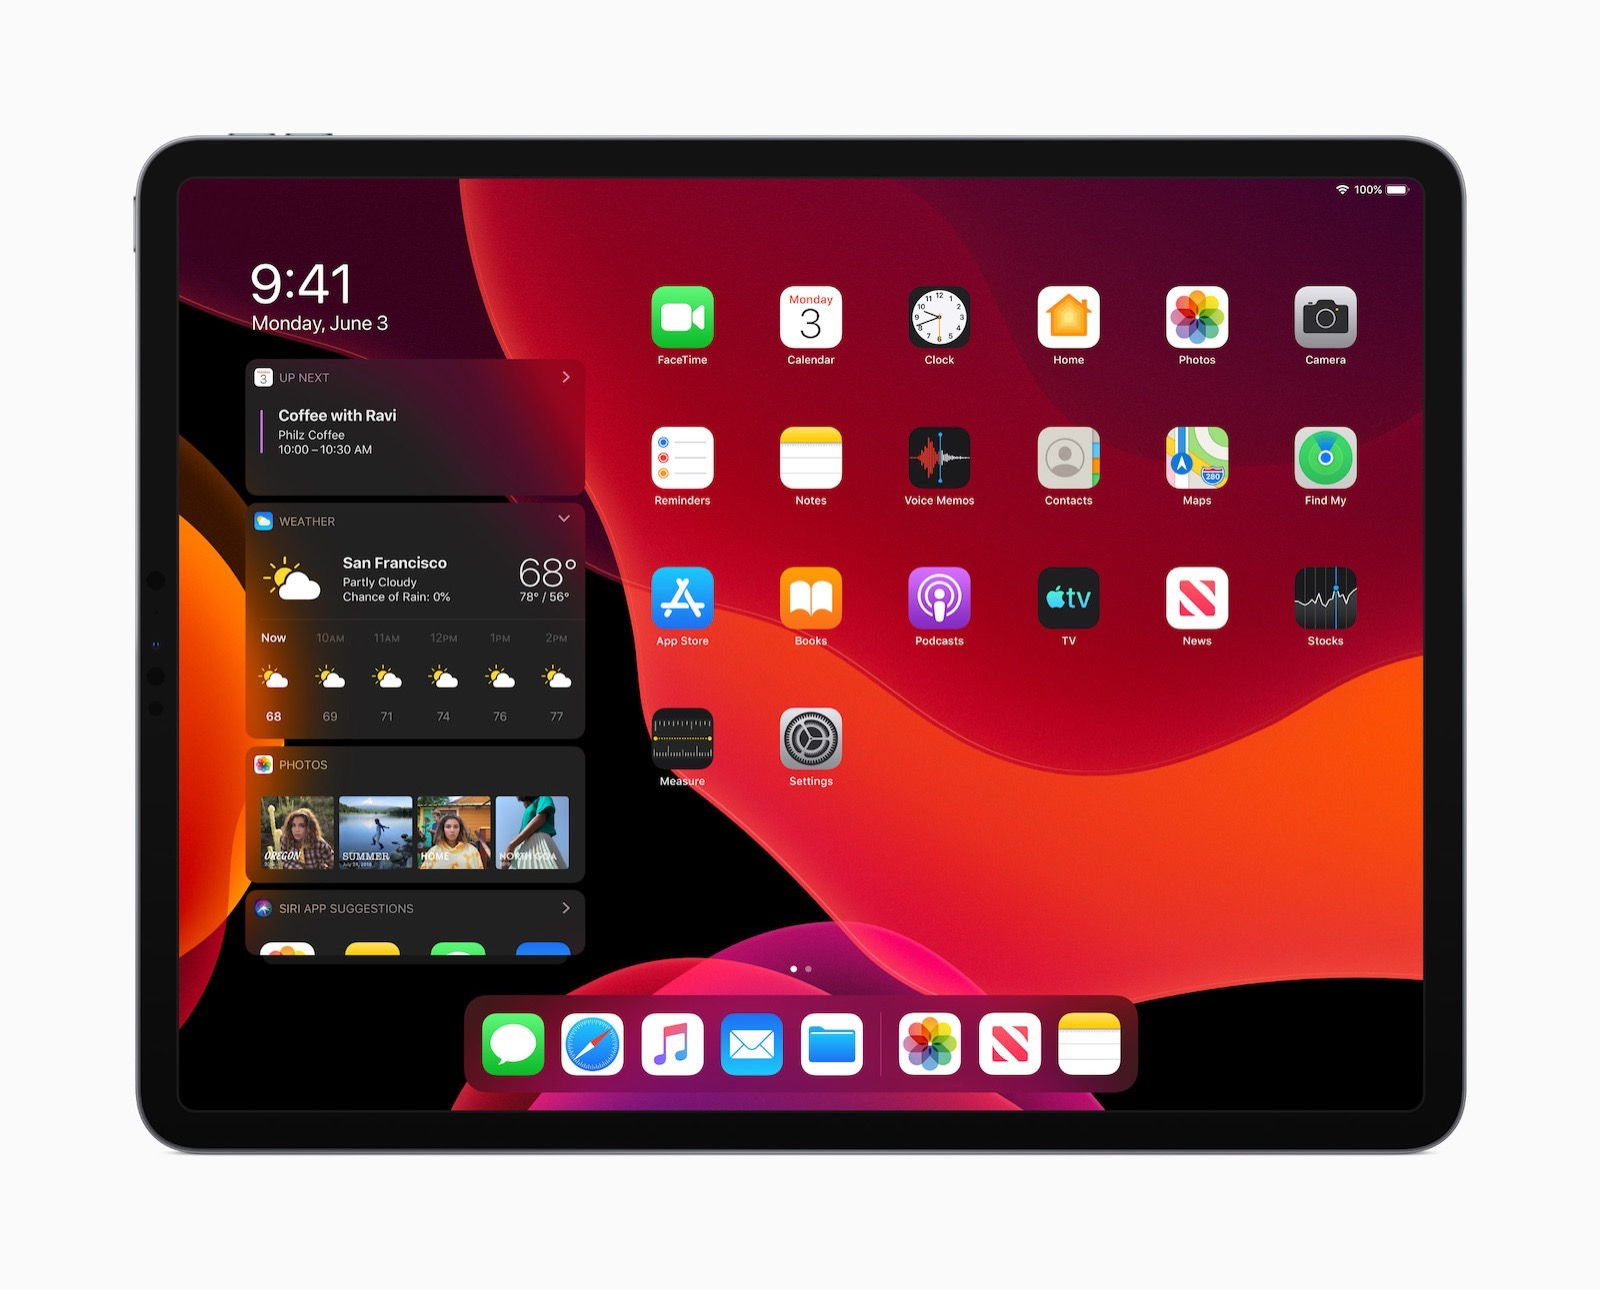 Apple_iPadOS_Today-View-Dark-Mode_060319.jpg